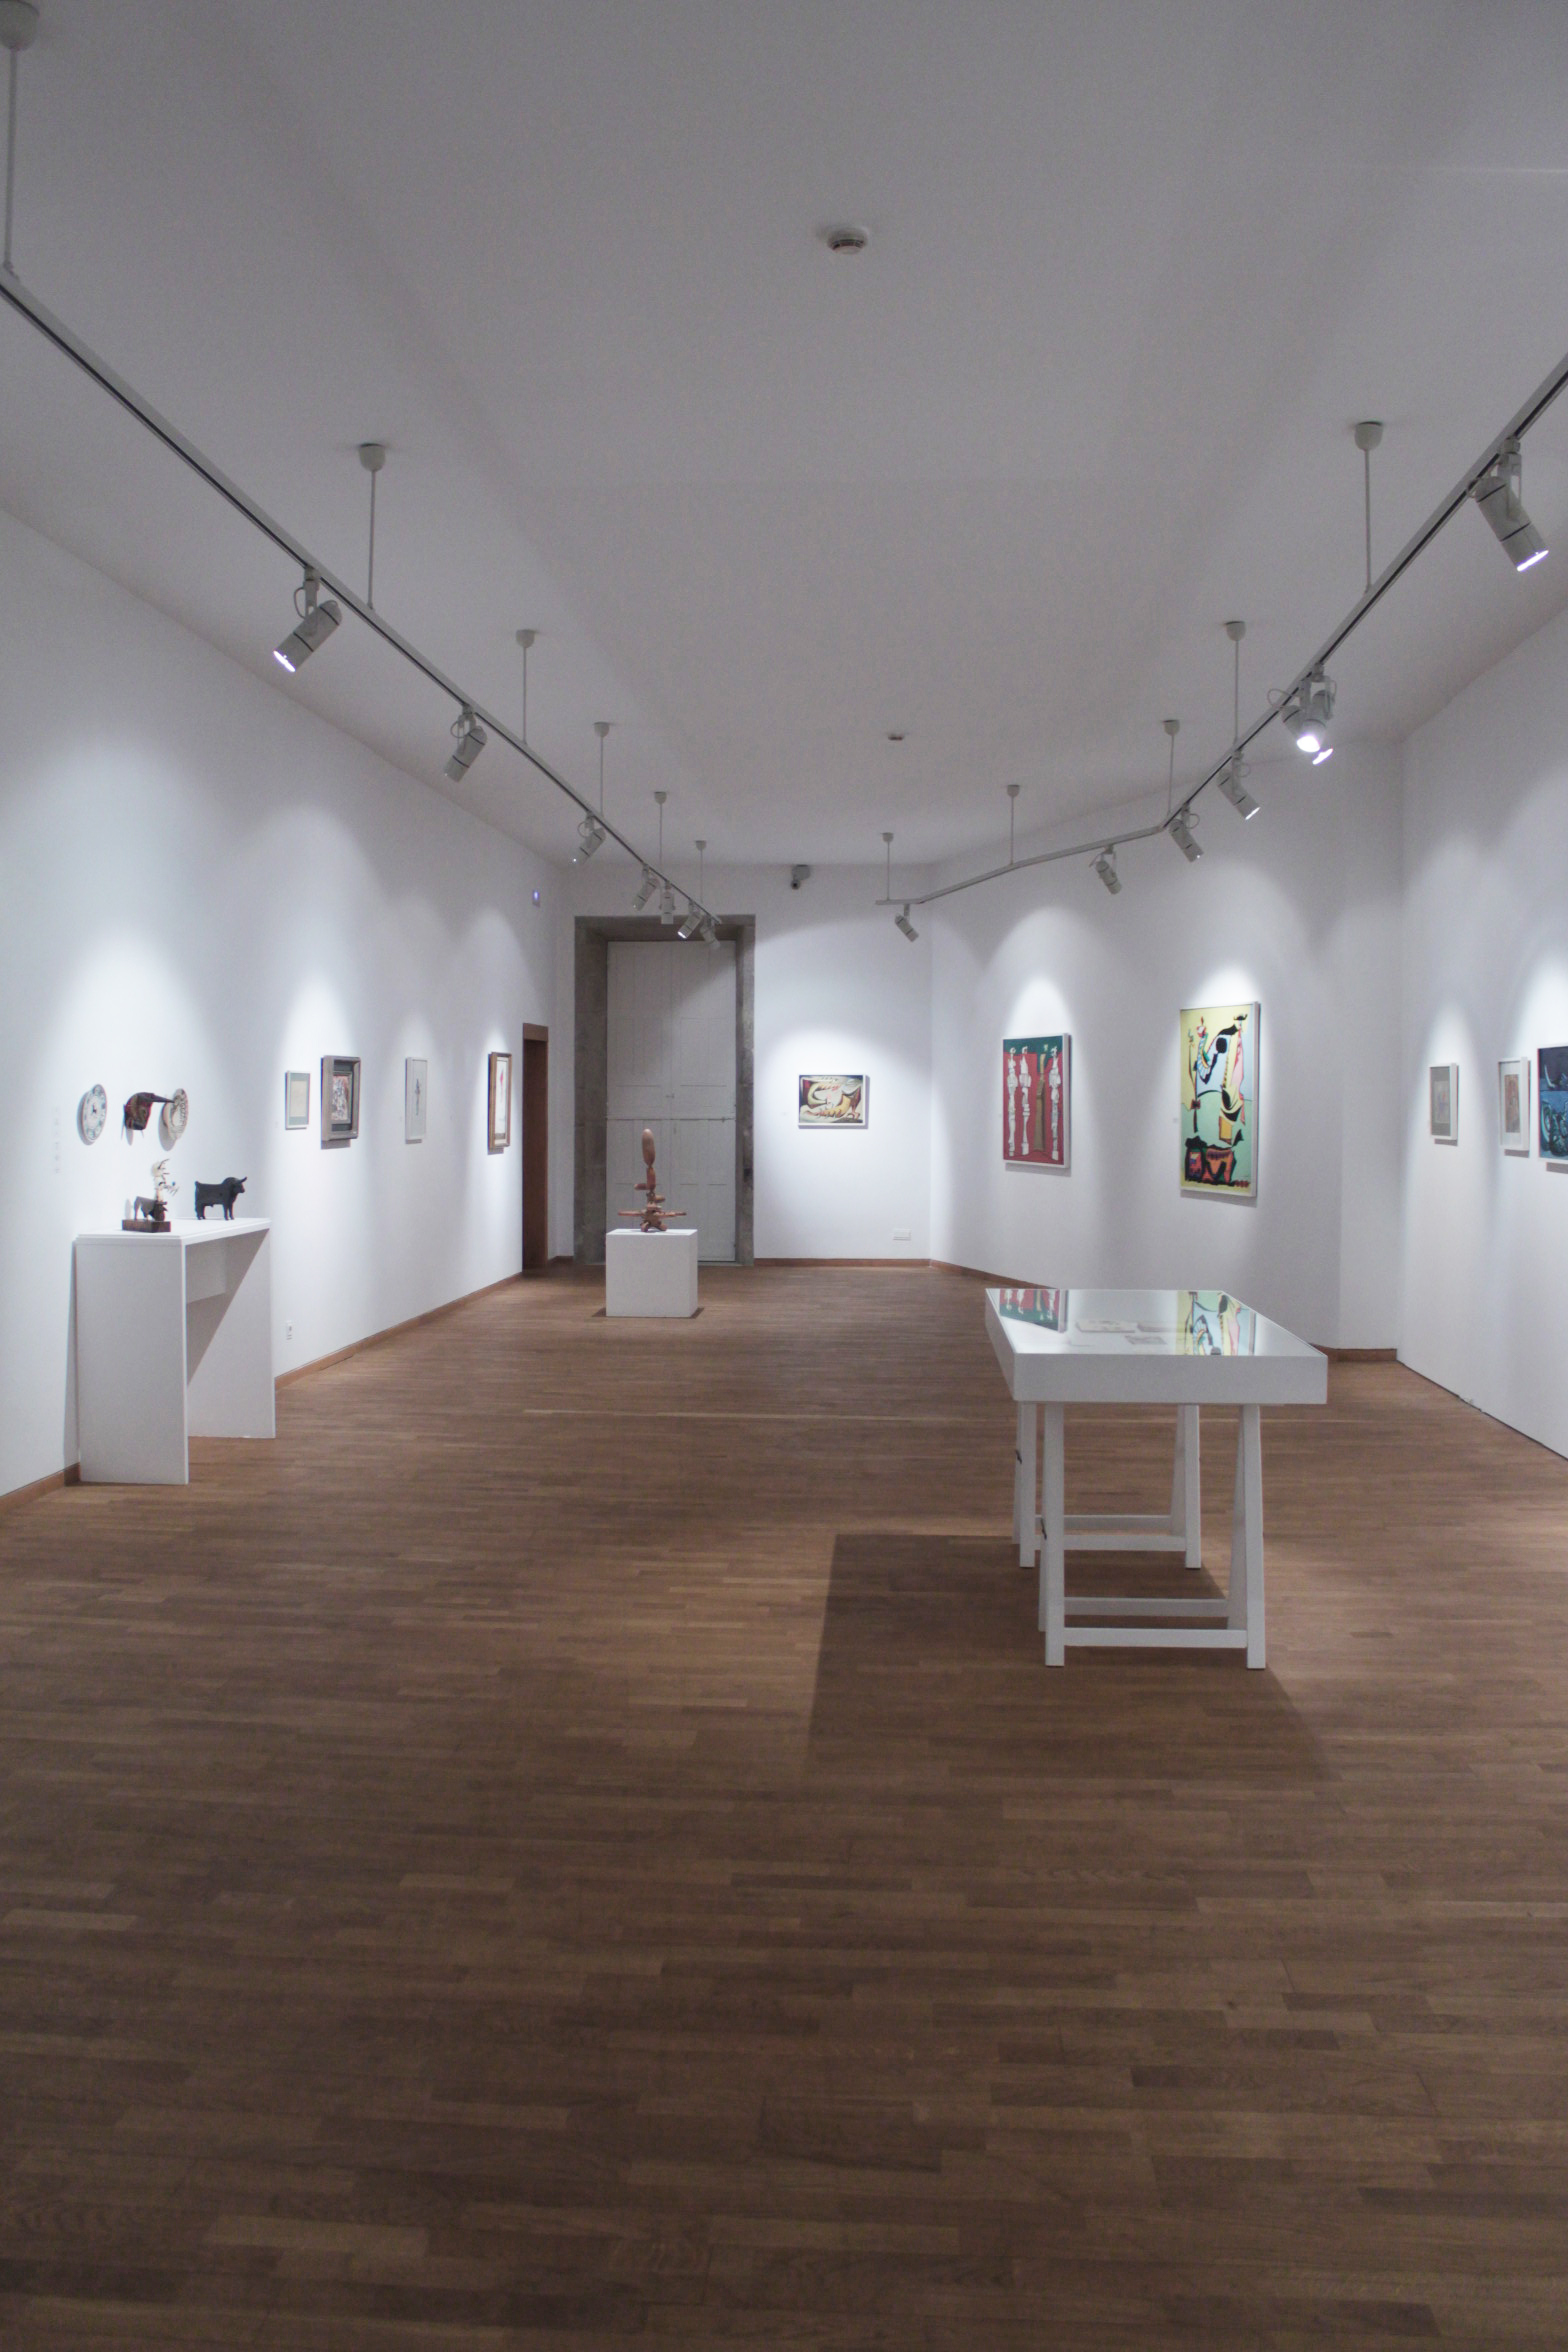 Exhibition Hall 2, 3rd floor